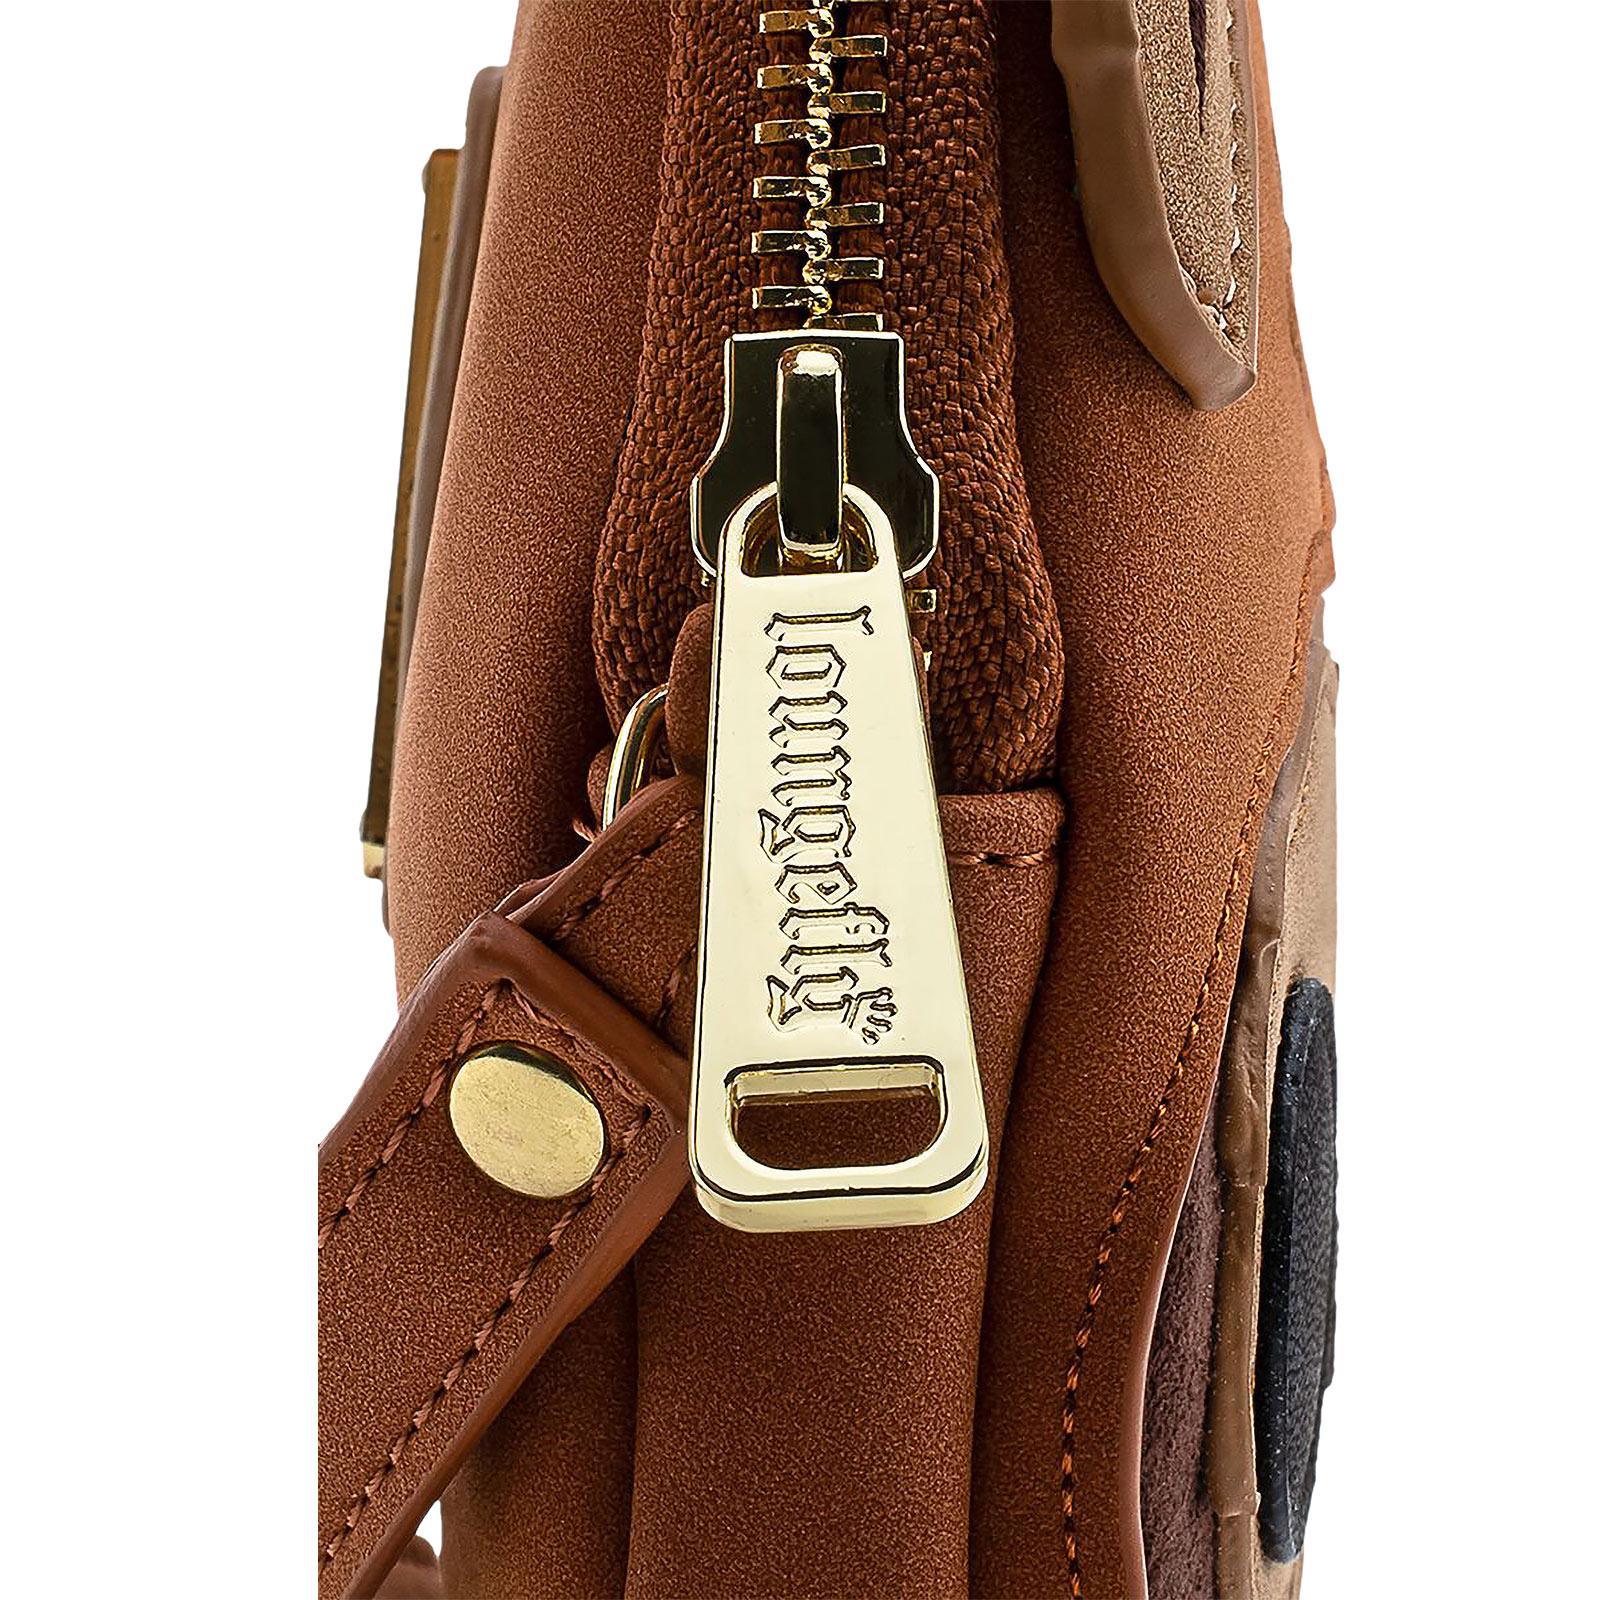 Star Wars - Wicket Mini Handtasche